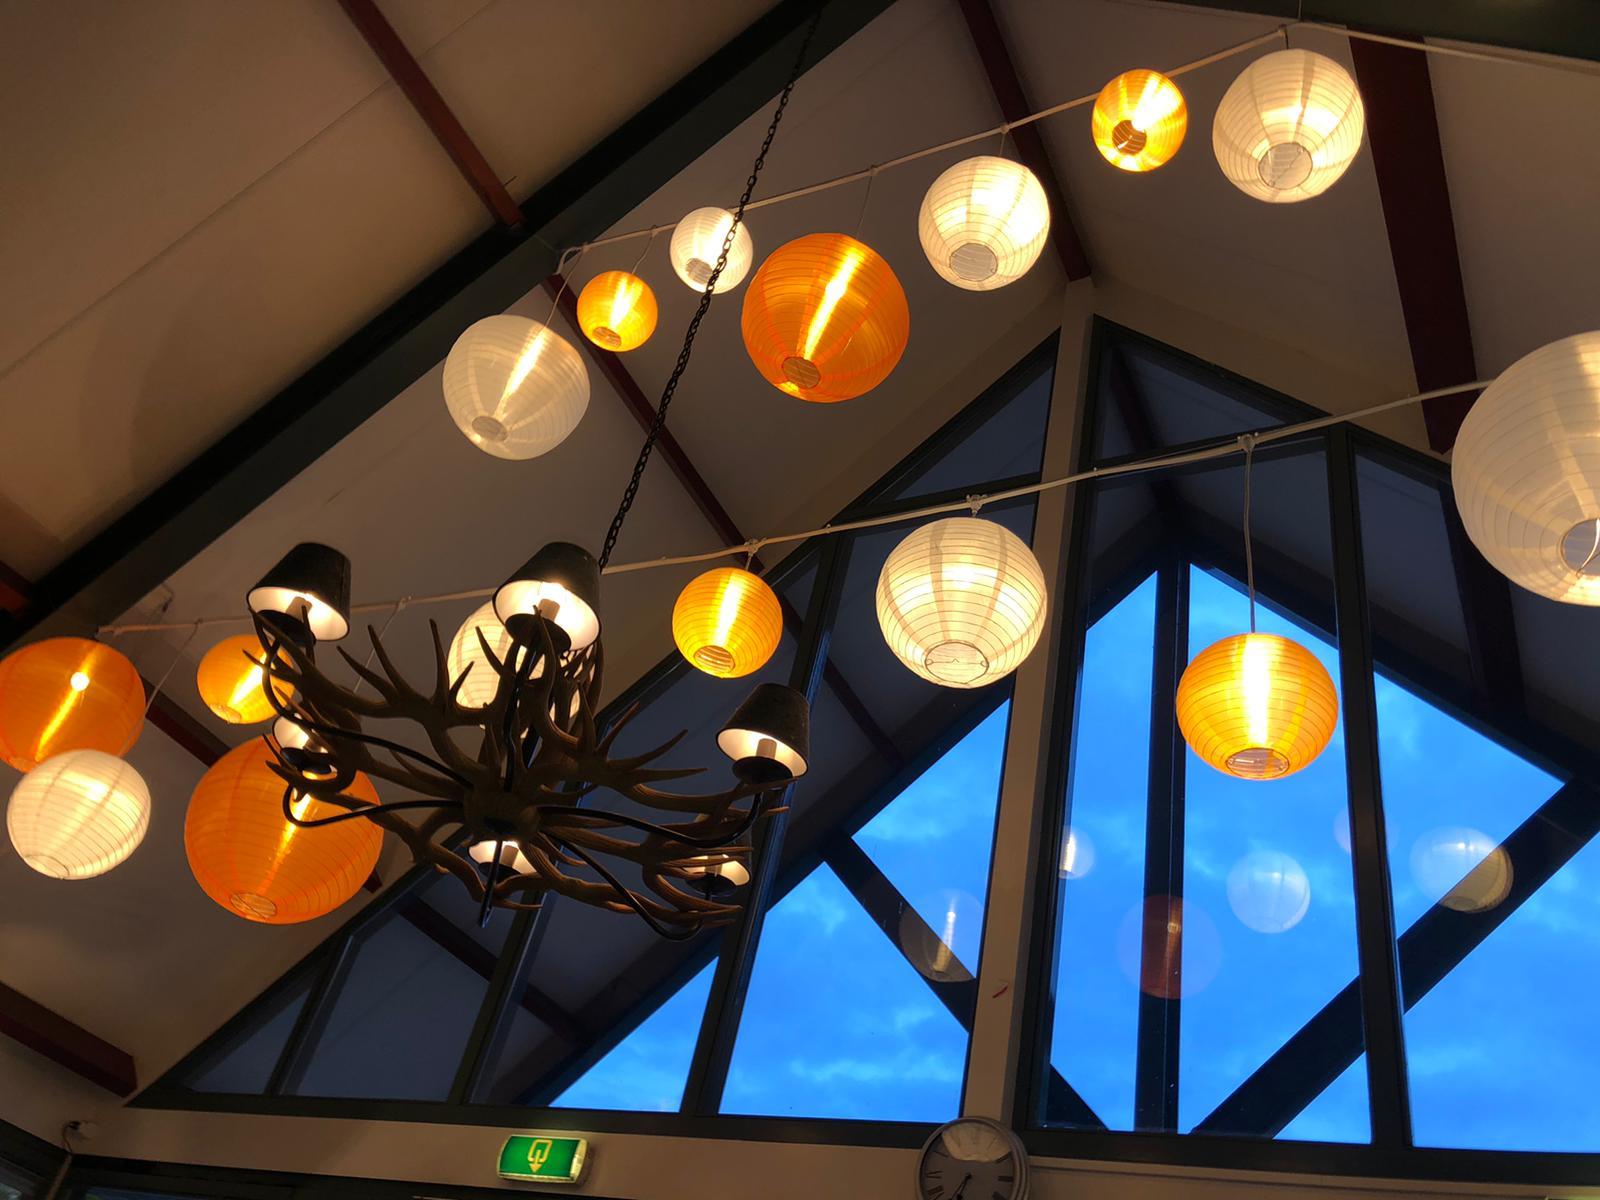 Lampionnen Entree droomparken Otterloo - Lampionwebshop